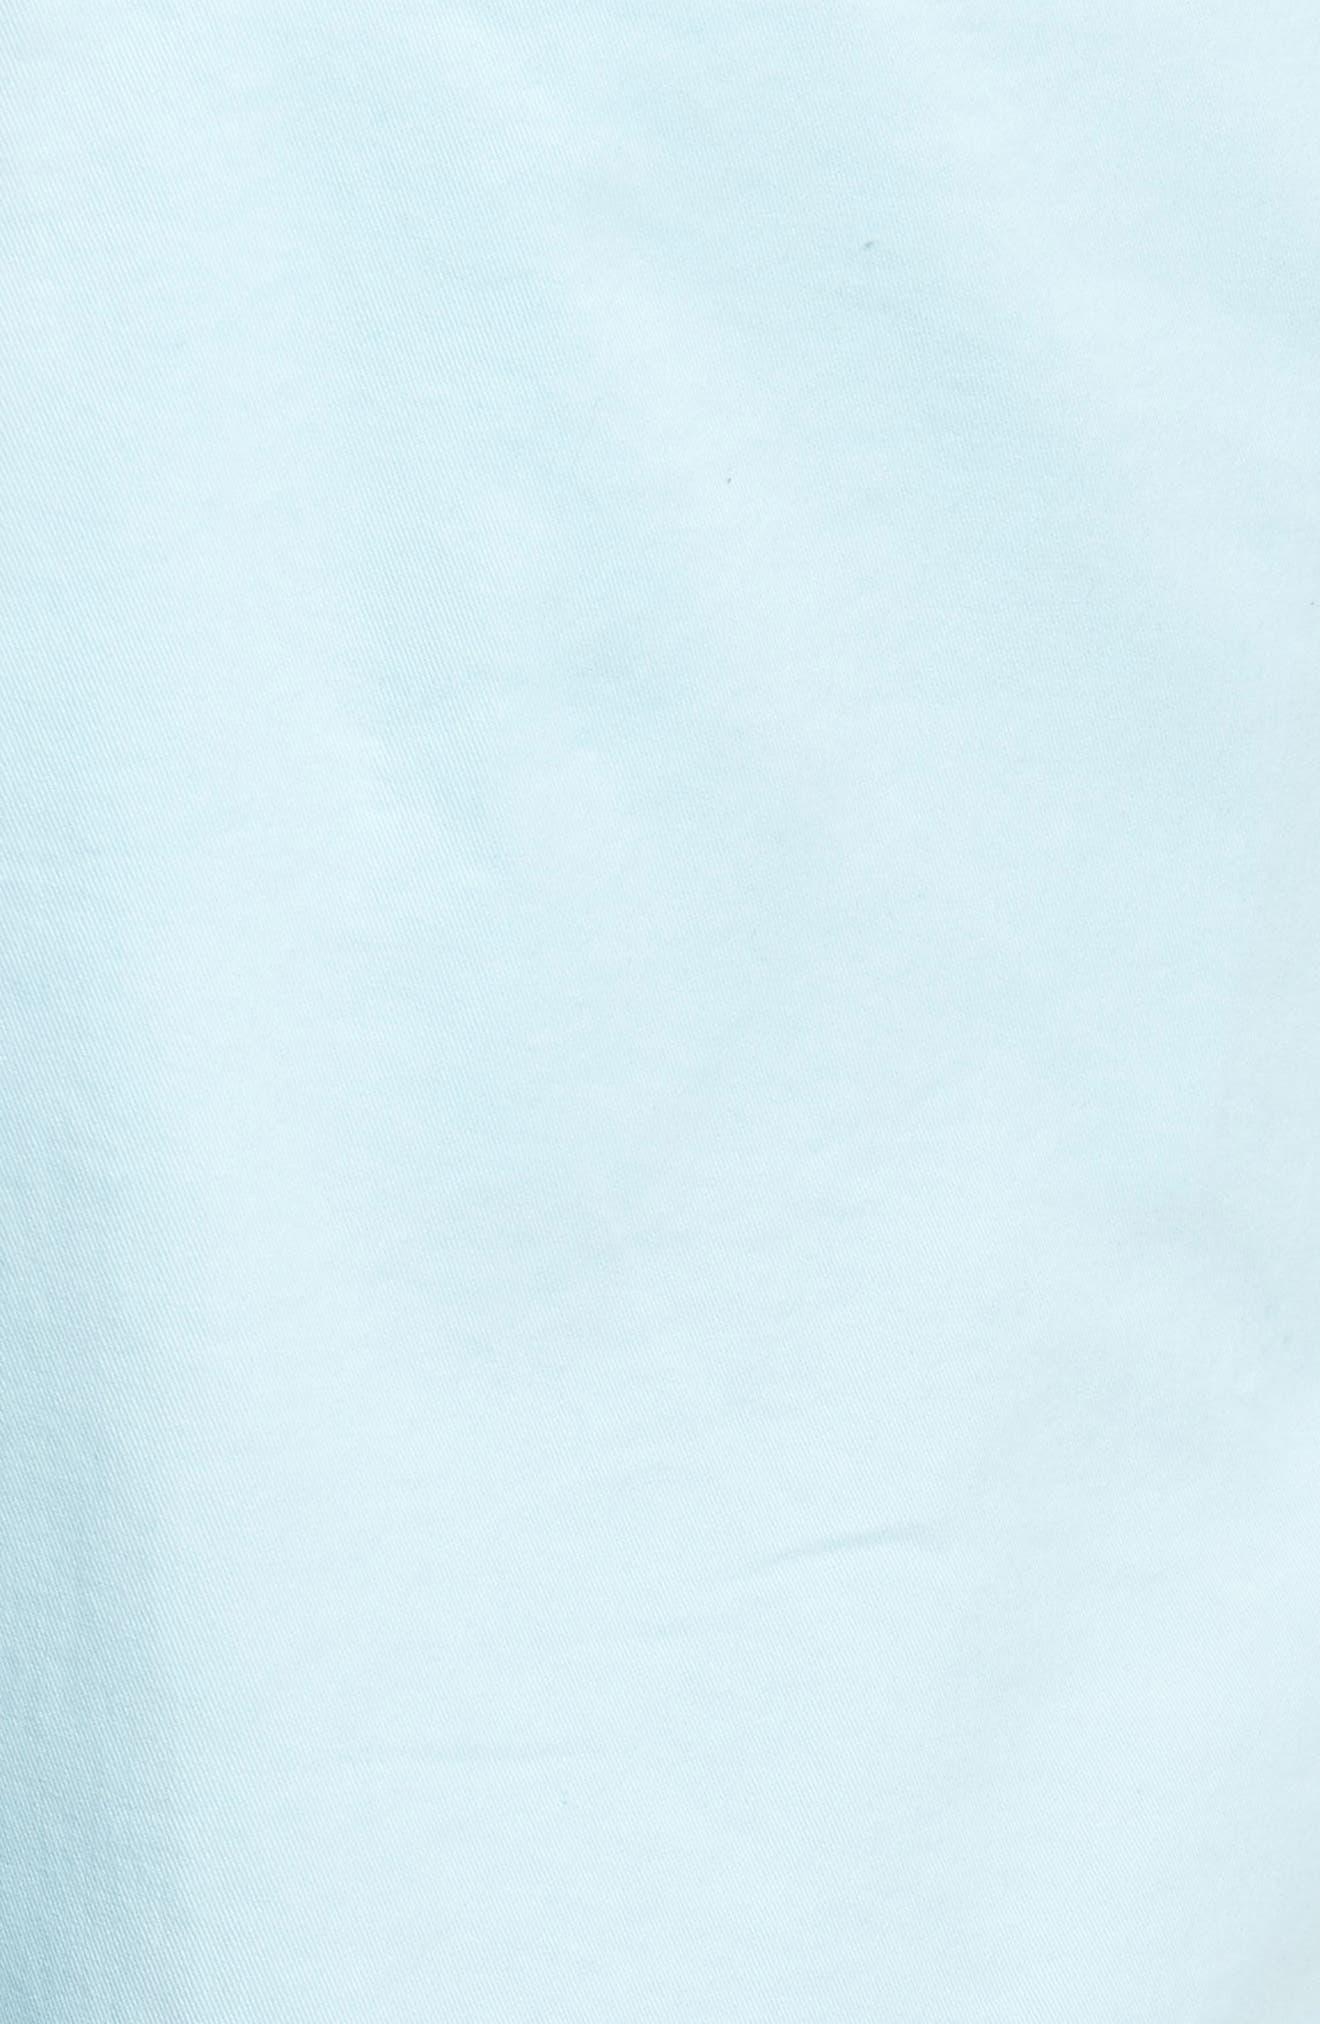 Ballard Slim Fit Stretch Chino 9-Inch Shorts,                             Alternate thumbnail 58, color,